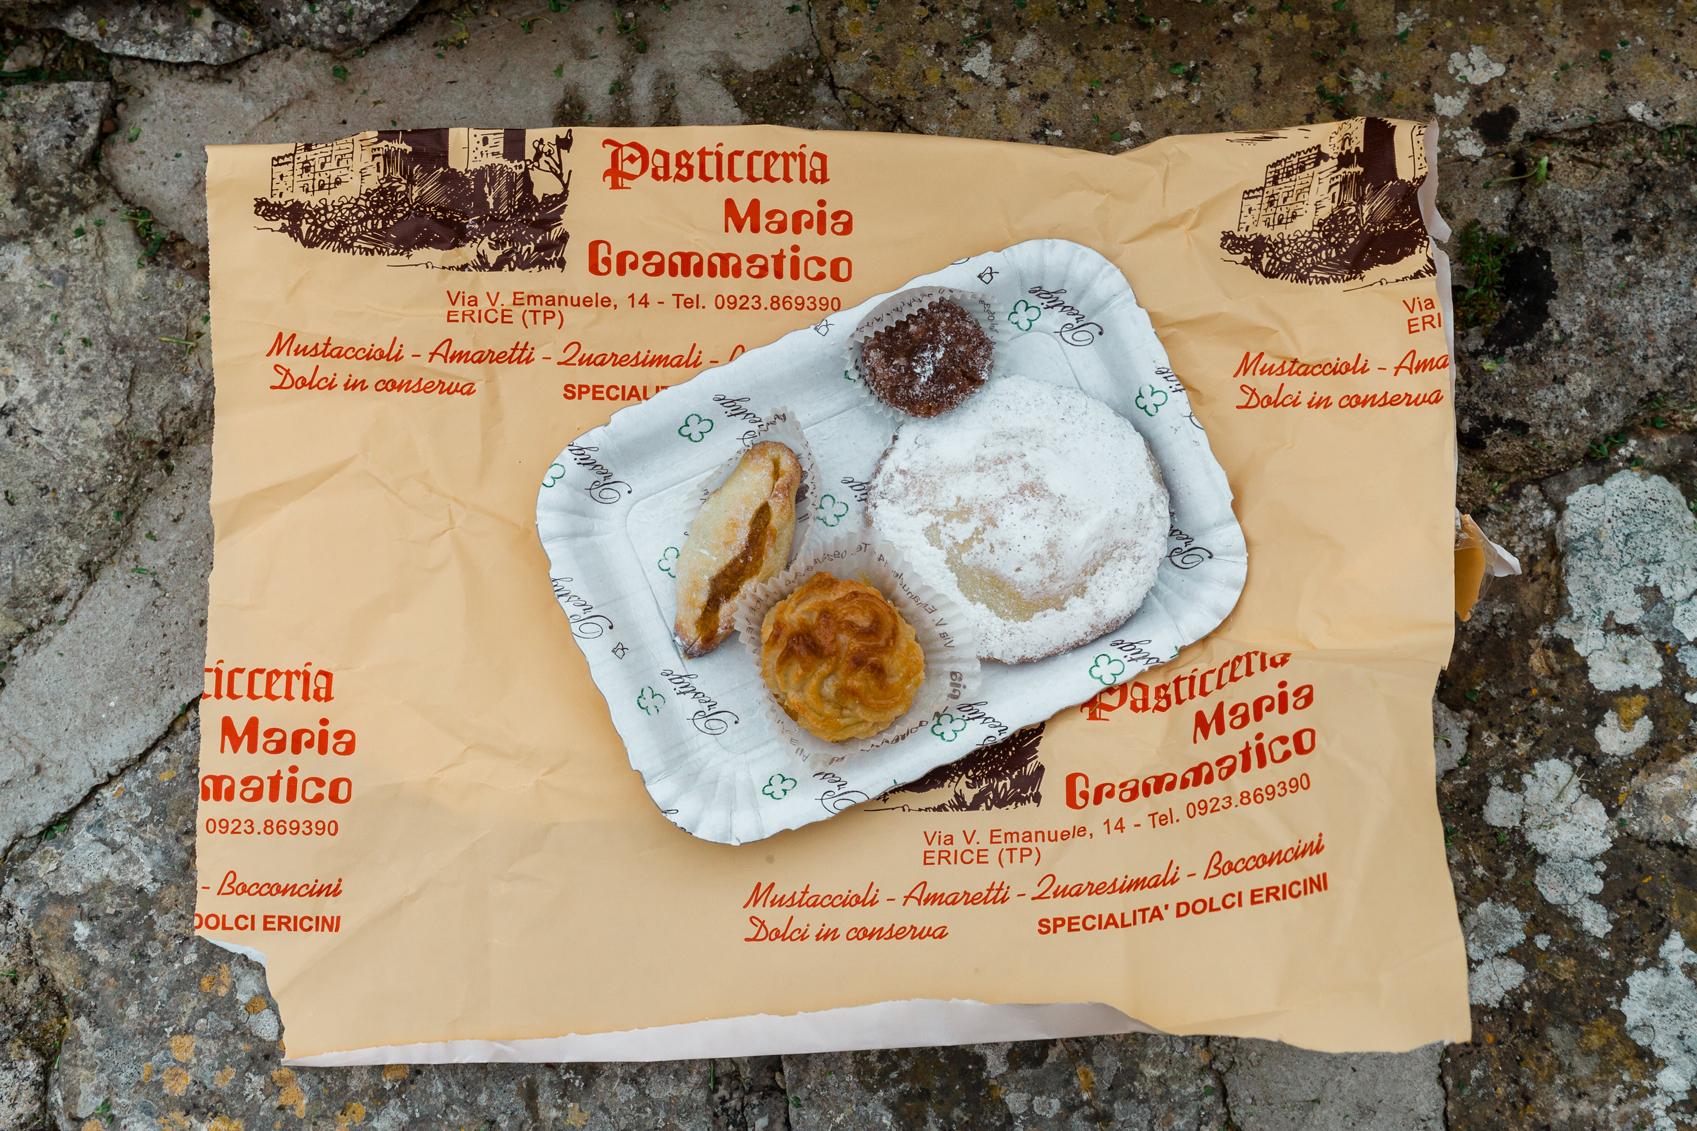 Koekjes van Pasticceria Maria Grammatico in Erice